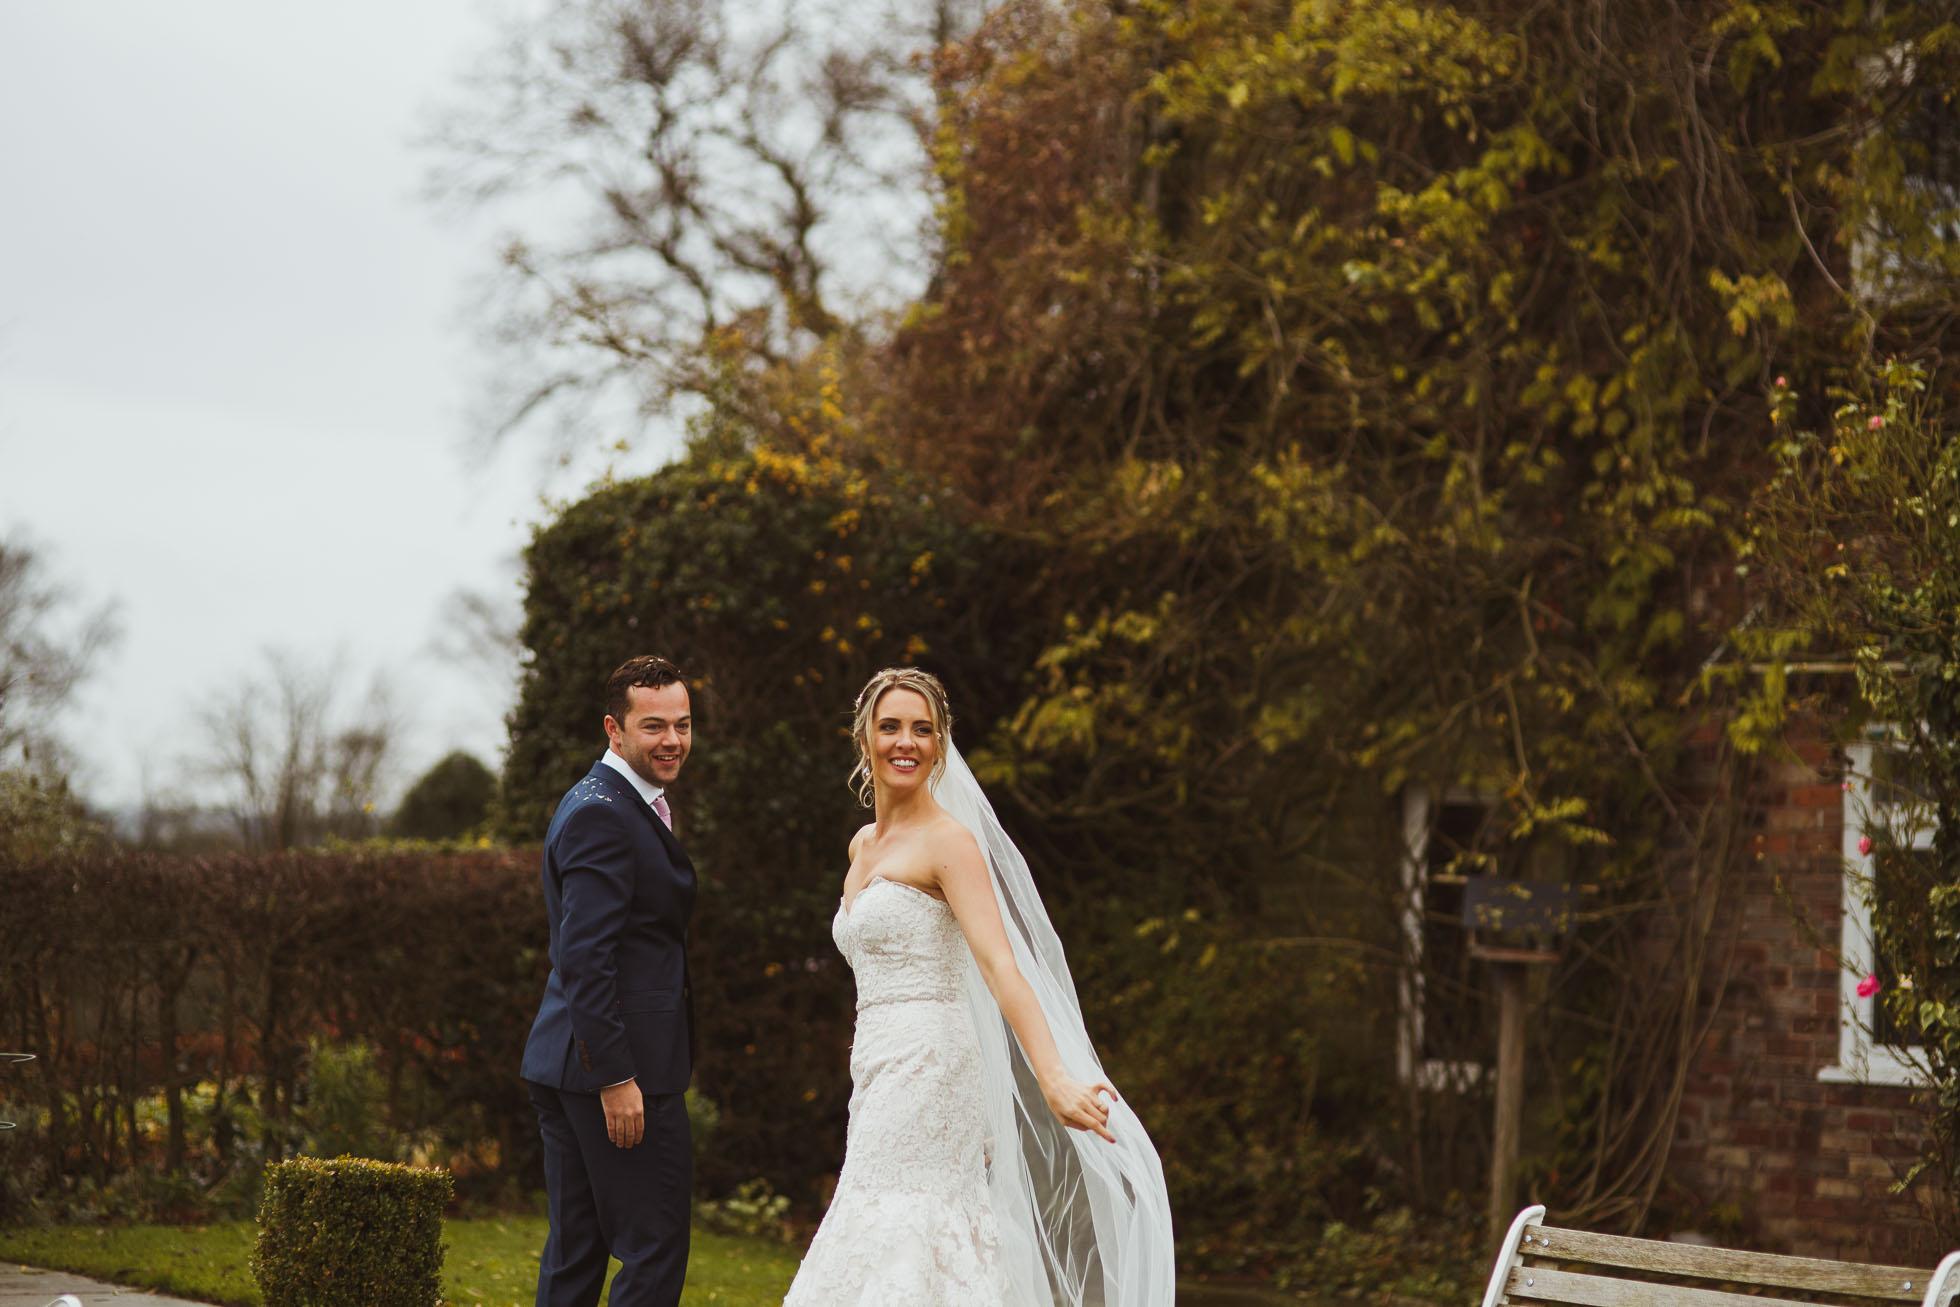 hilltop country house wedding photographer-42.jpg